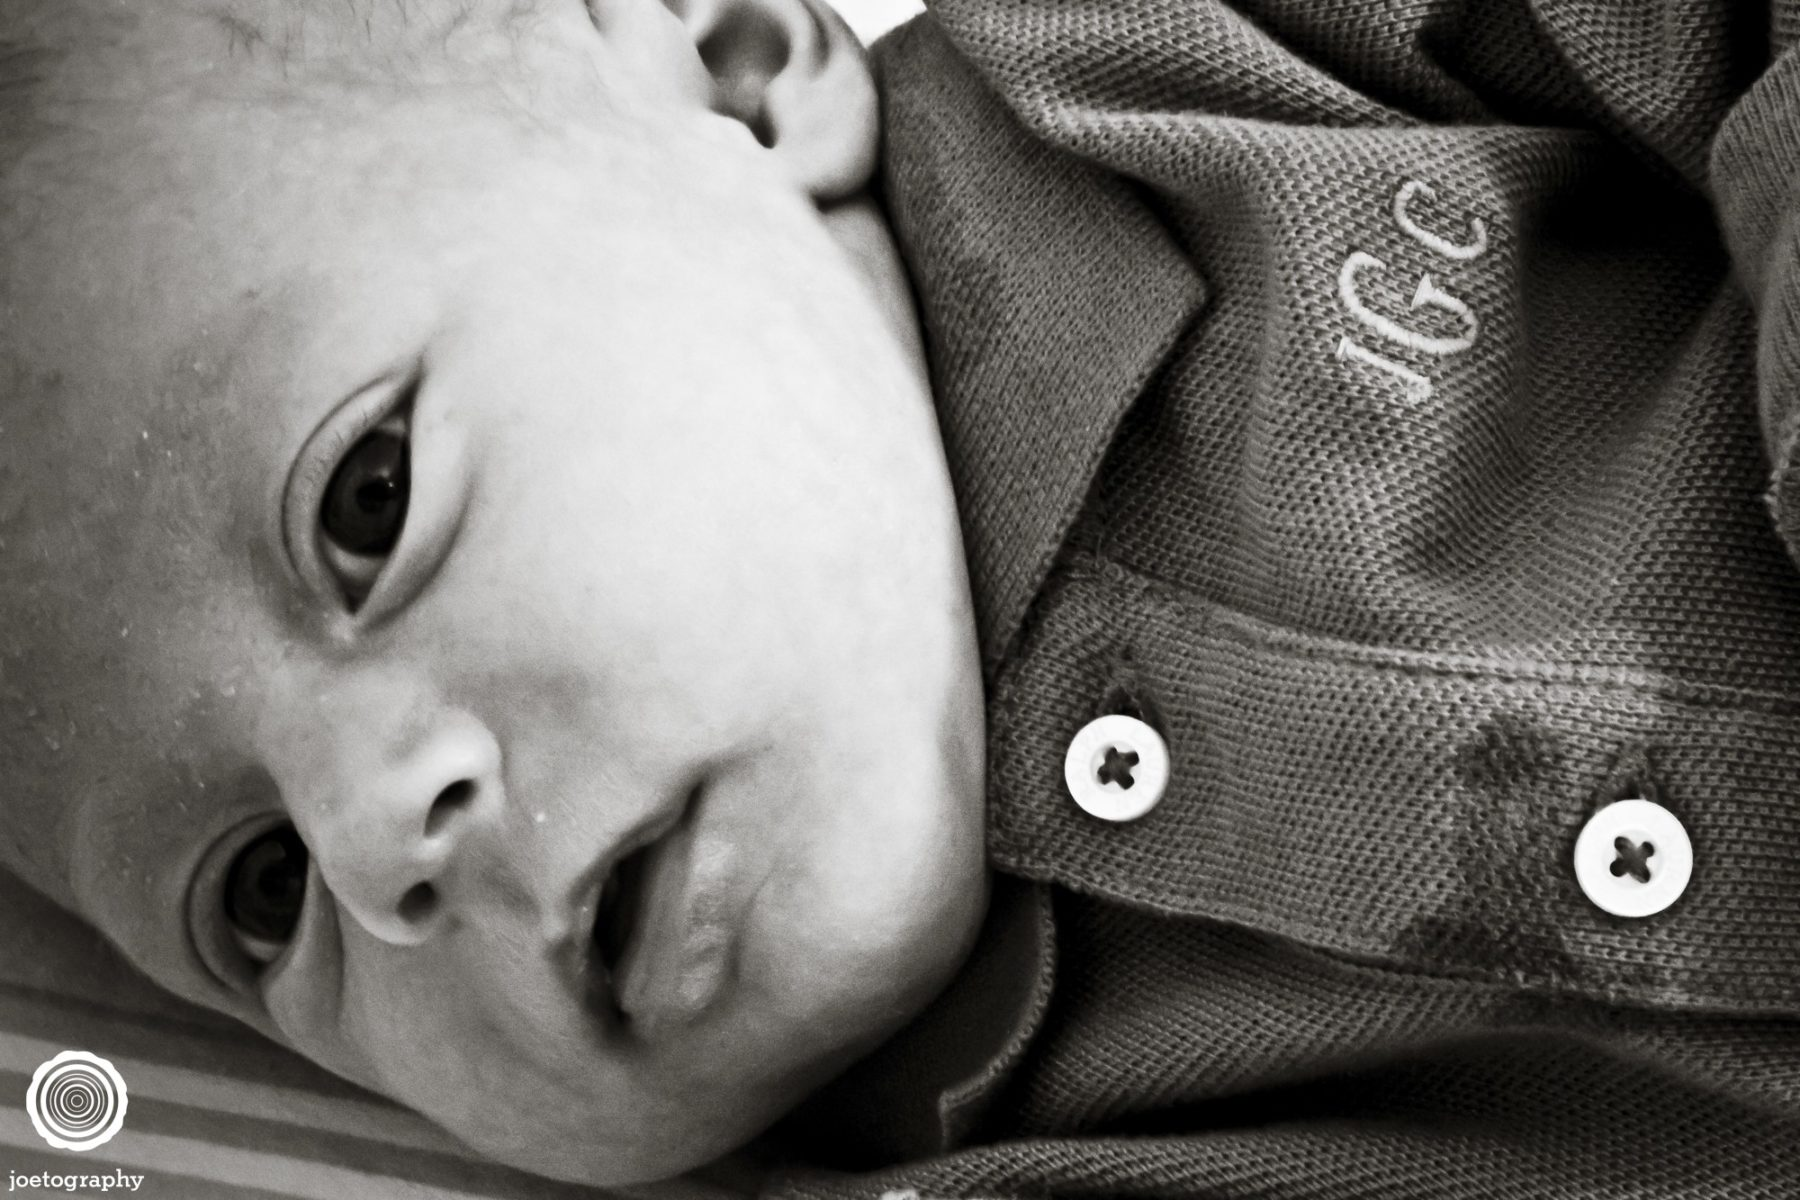 Glovers-Newborn-Photos-Indianapolis-Indiana-5